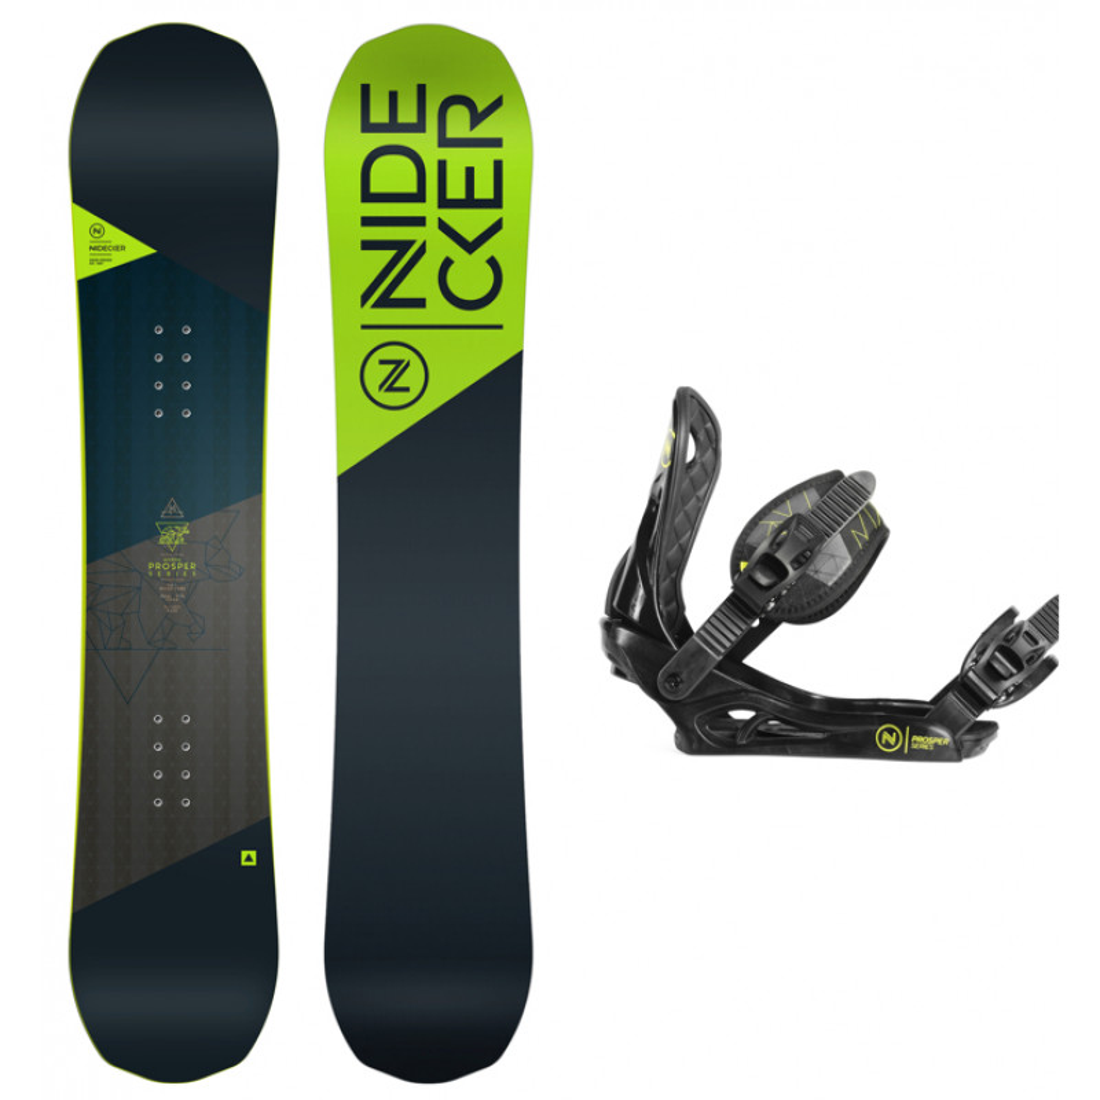 27c4d8ea1b0 Snowboard Pack Boy Nidecker Prosper + Bindings | Buy snowboard ...